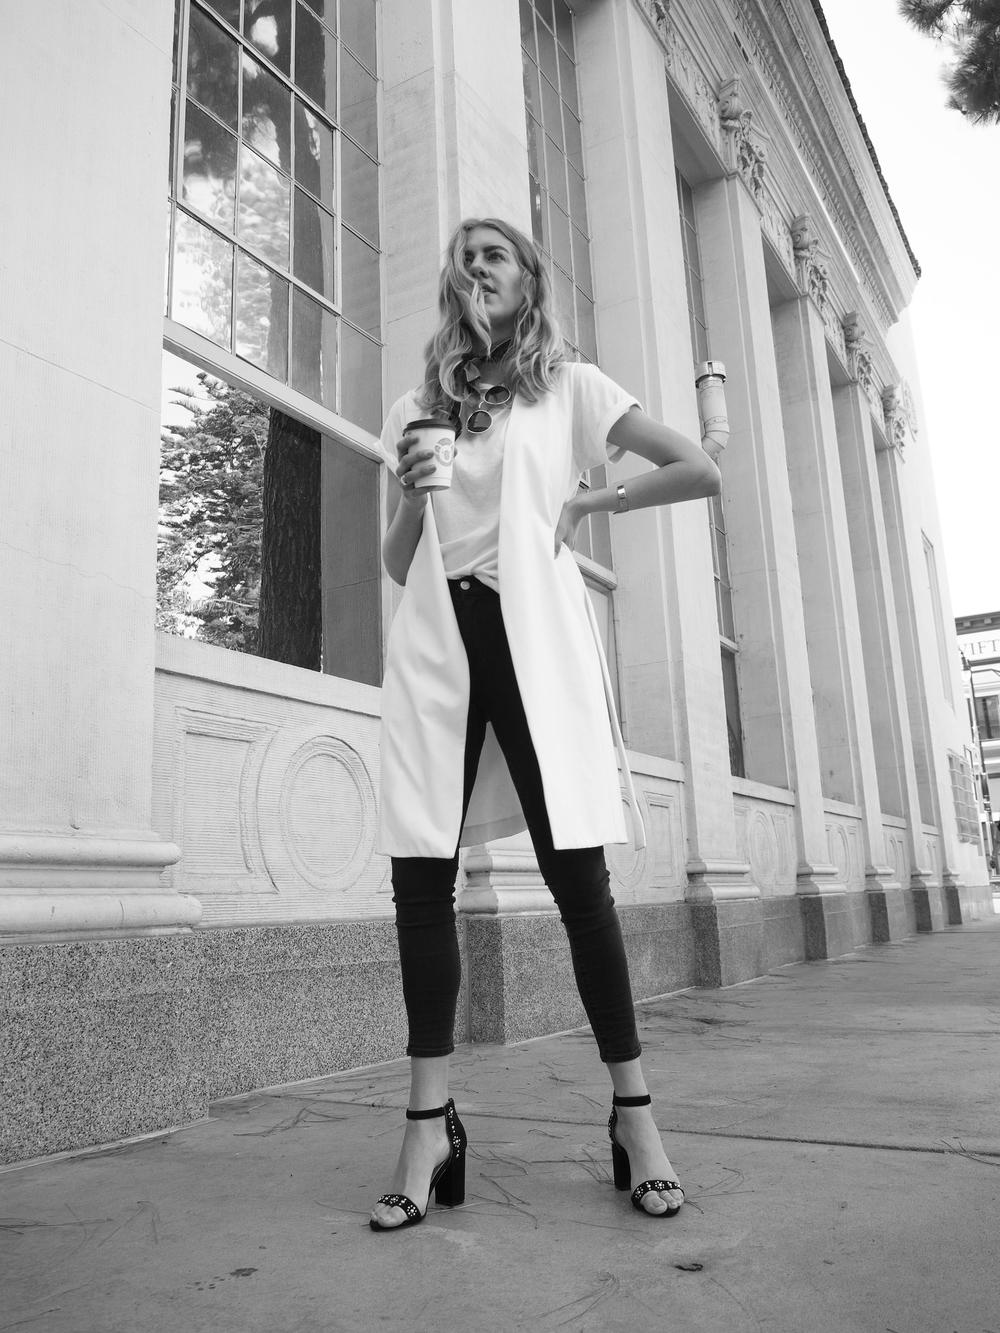 Vevre en Simplicité Zady Tee Vince Ponte Vest Madewell High Rise Denim Street Style Look x Taylr Anne www.taylranne.com